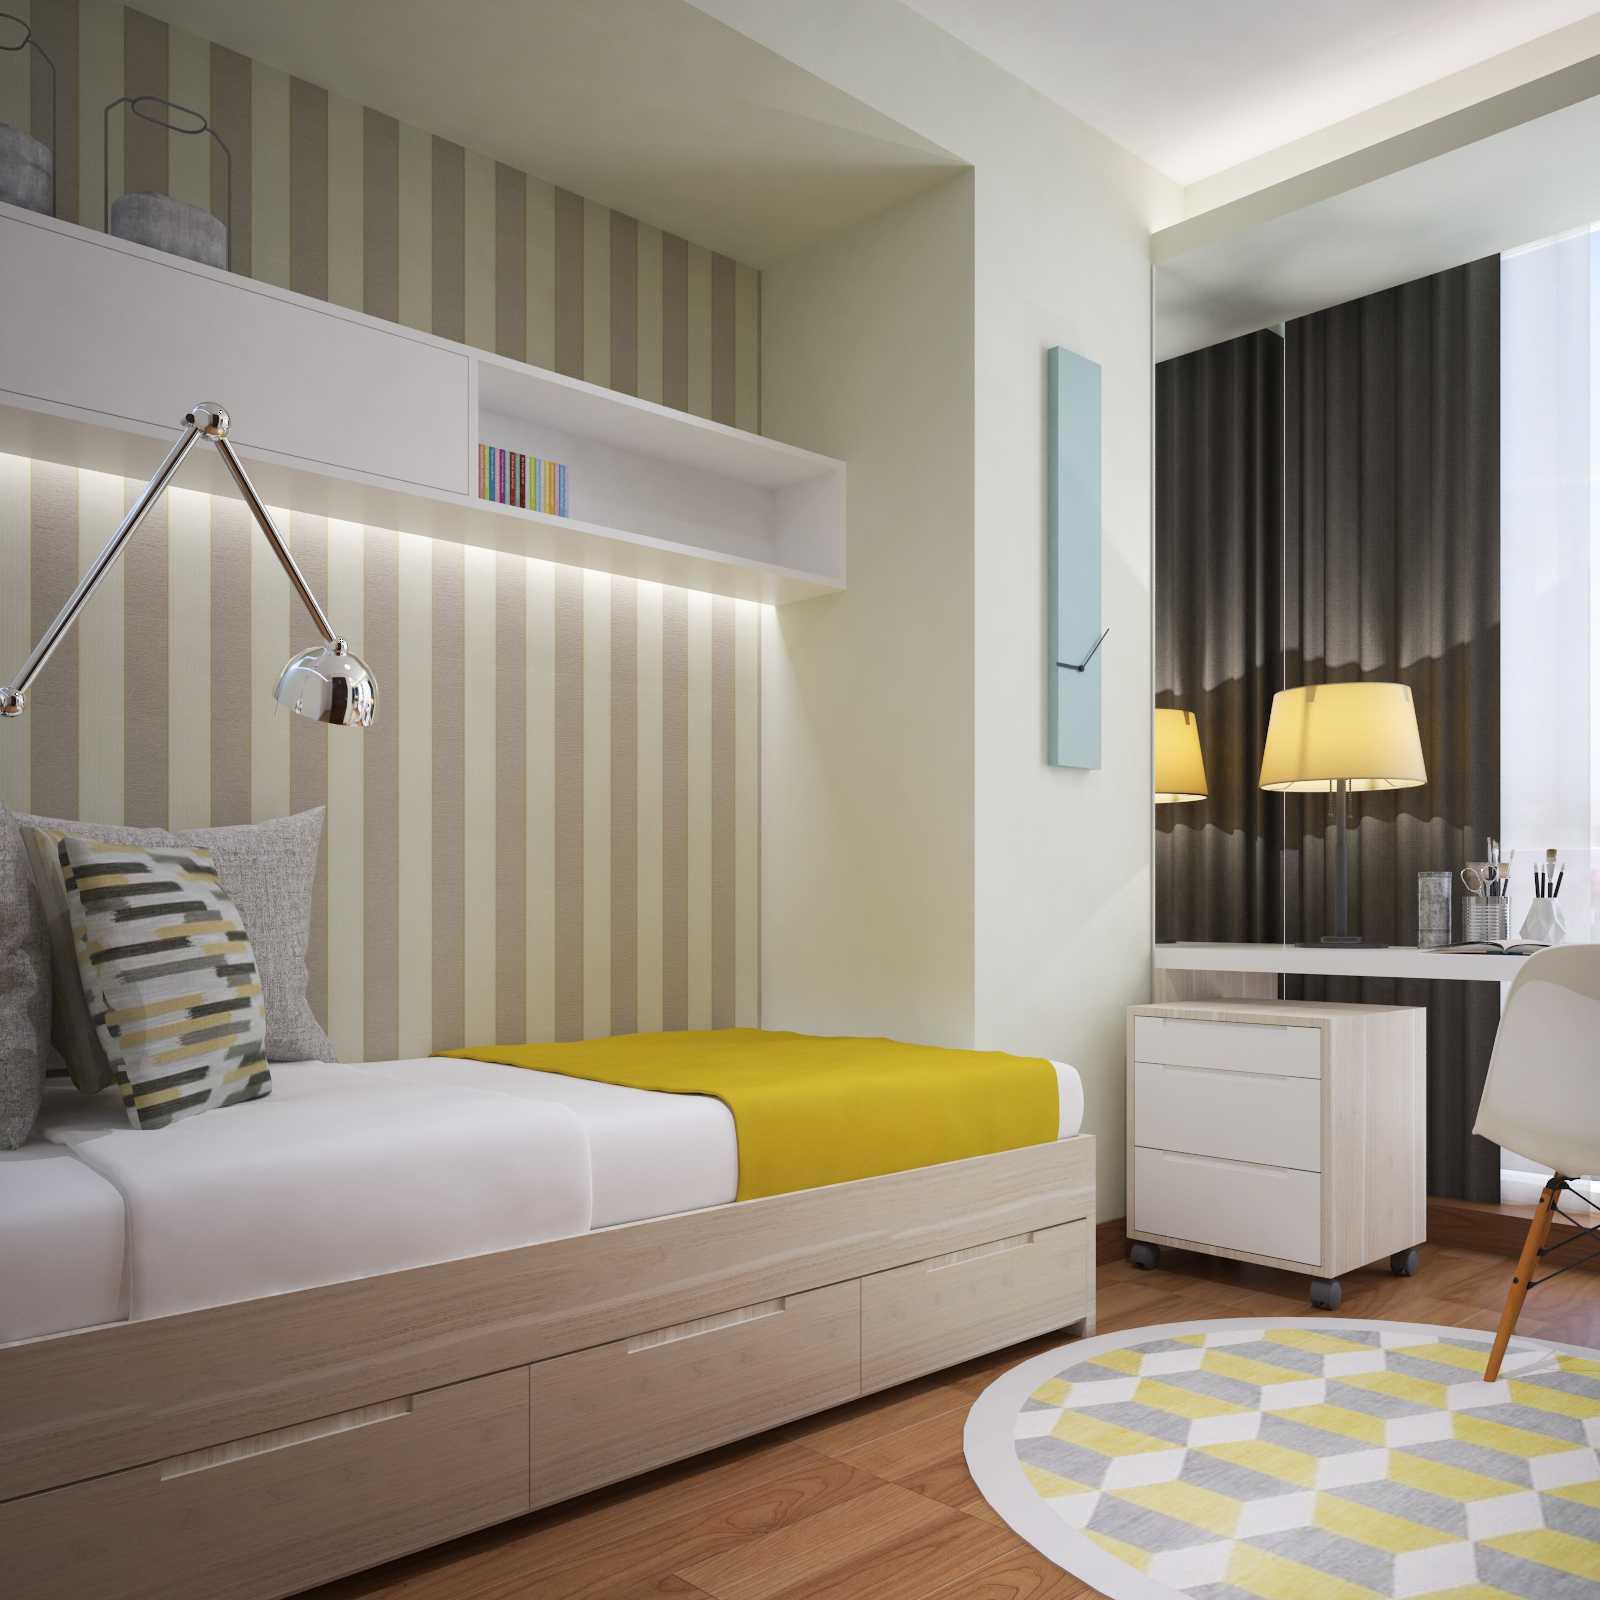 Pt. Garisprada Setiabudi Skygarden Apartmen Setiabudi, South Jakarta City, Jakarta, Indonesia Setiabudi Jakarta Bedroom 2 Skandinavia  25404